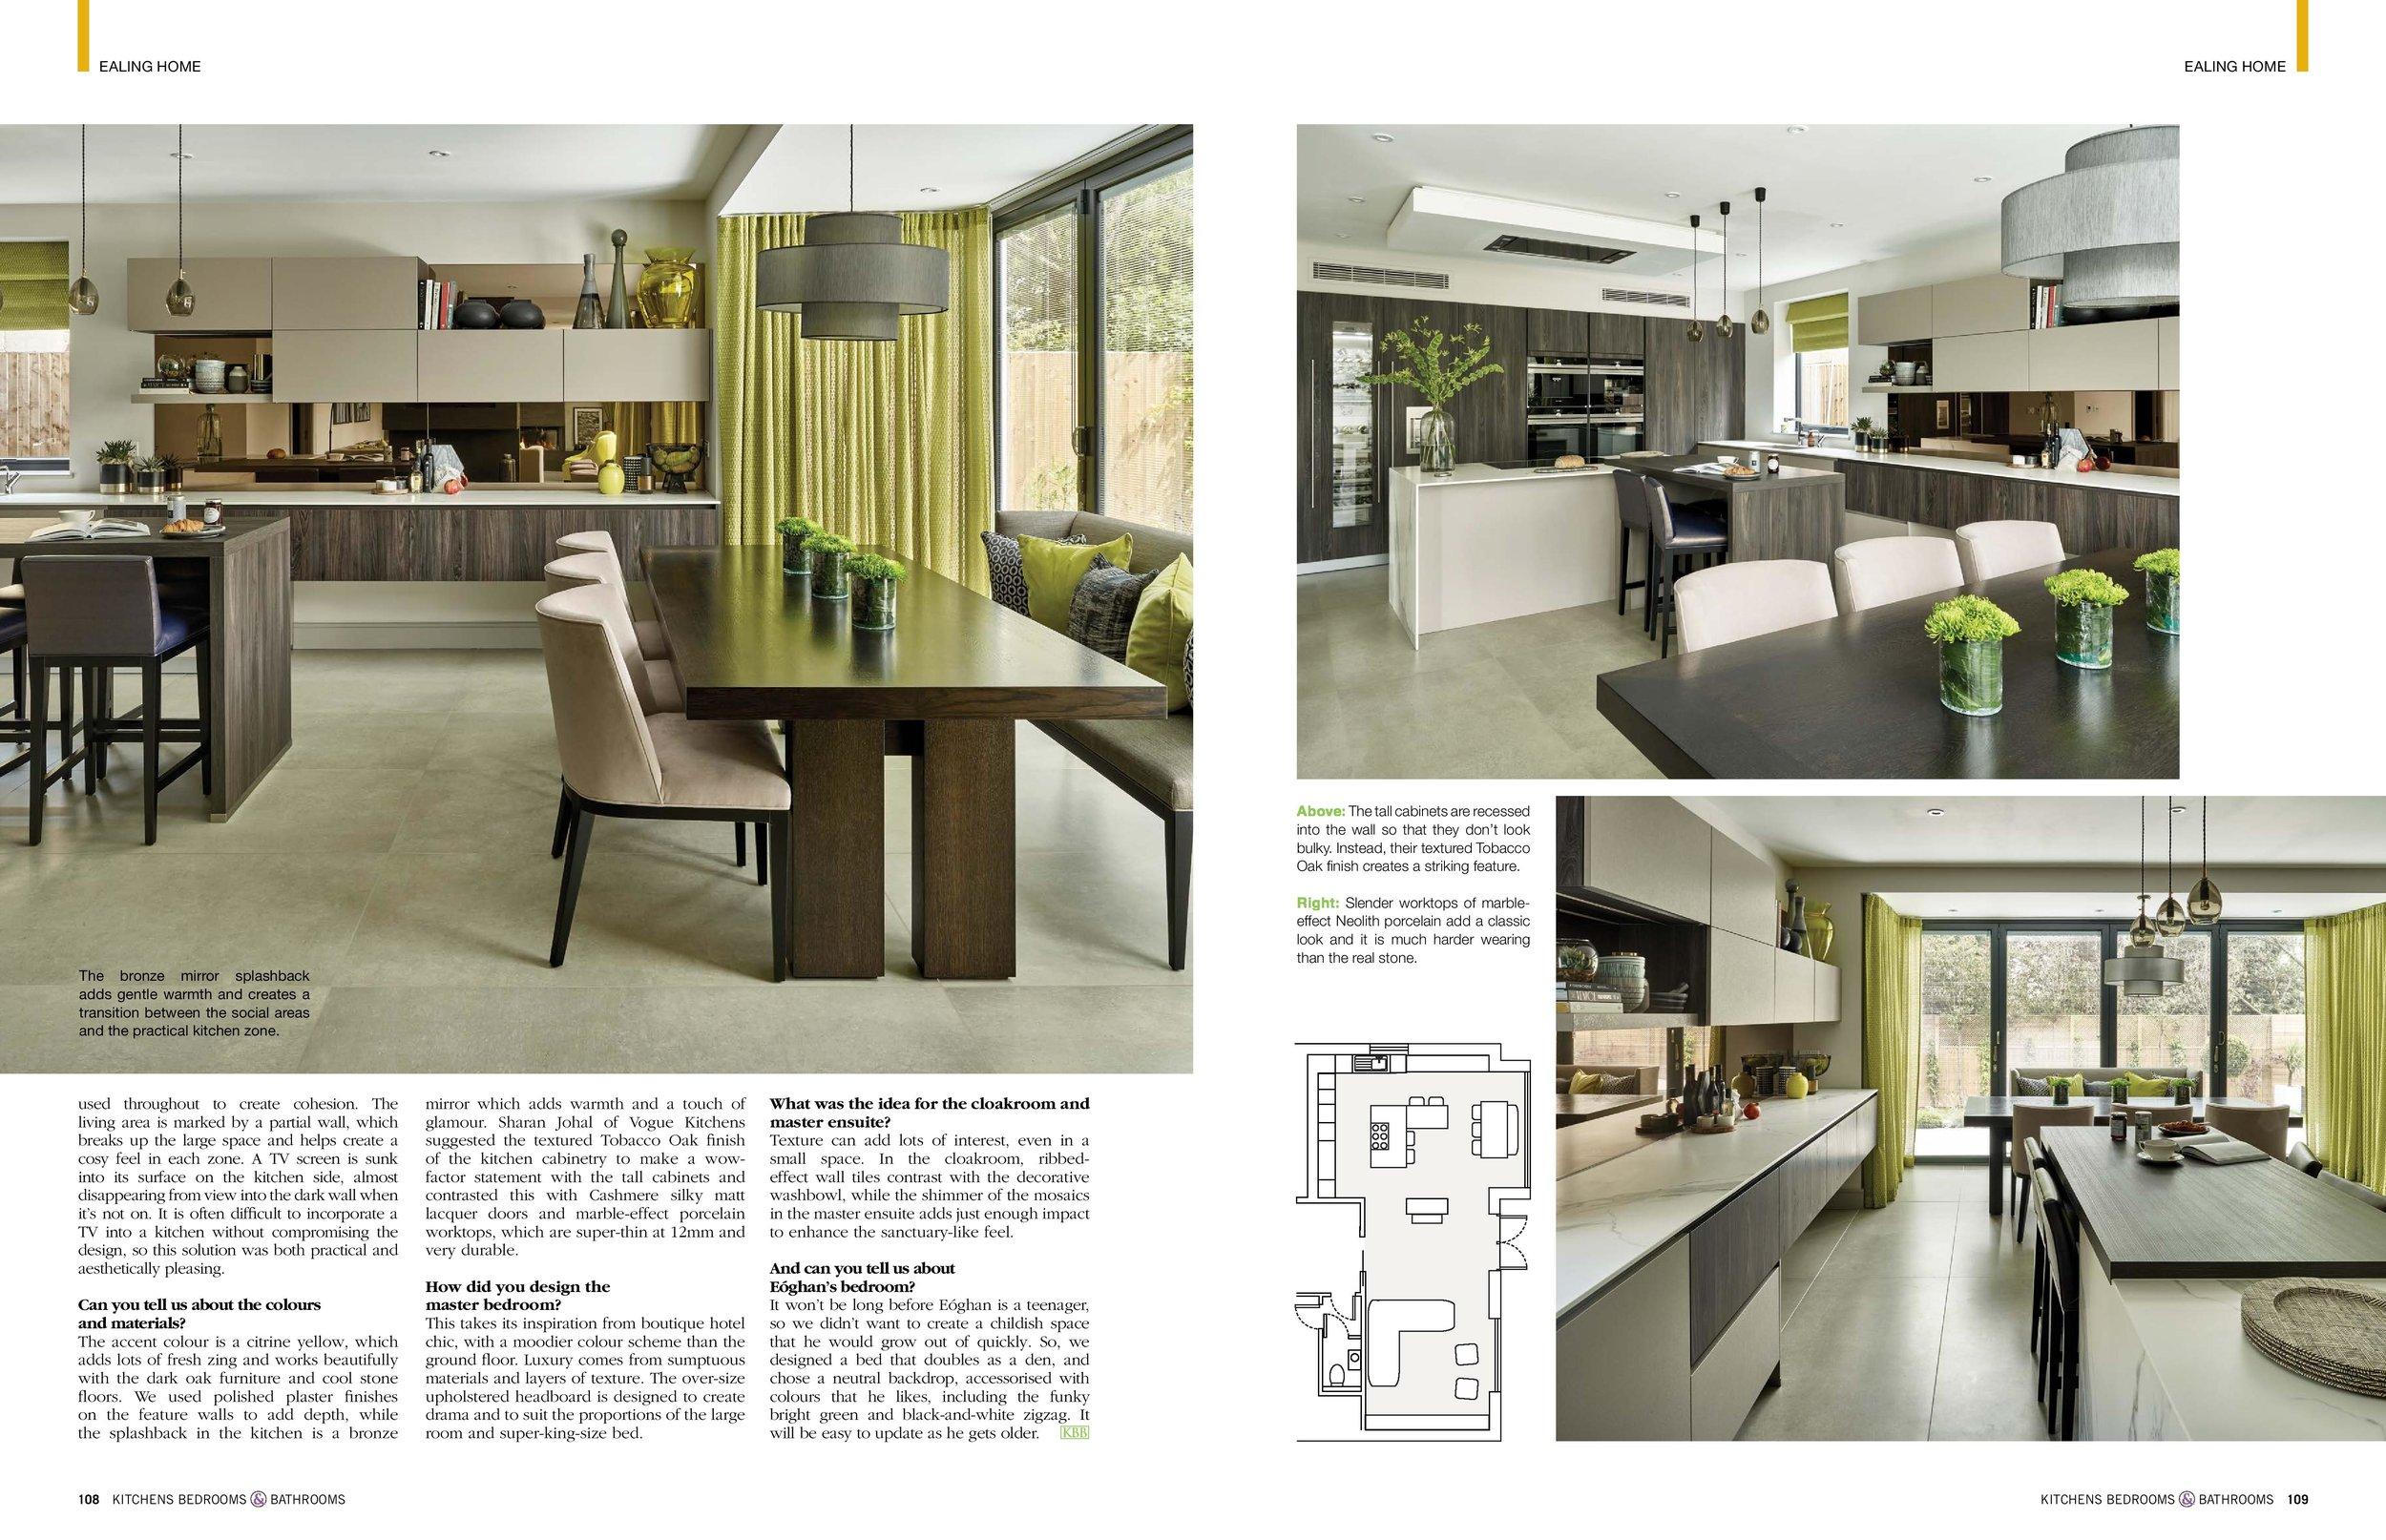 KBBJULY17-Vogue-page-002.jpg